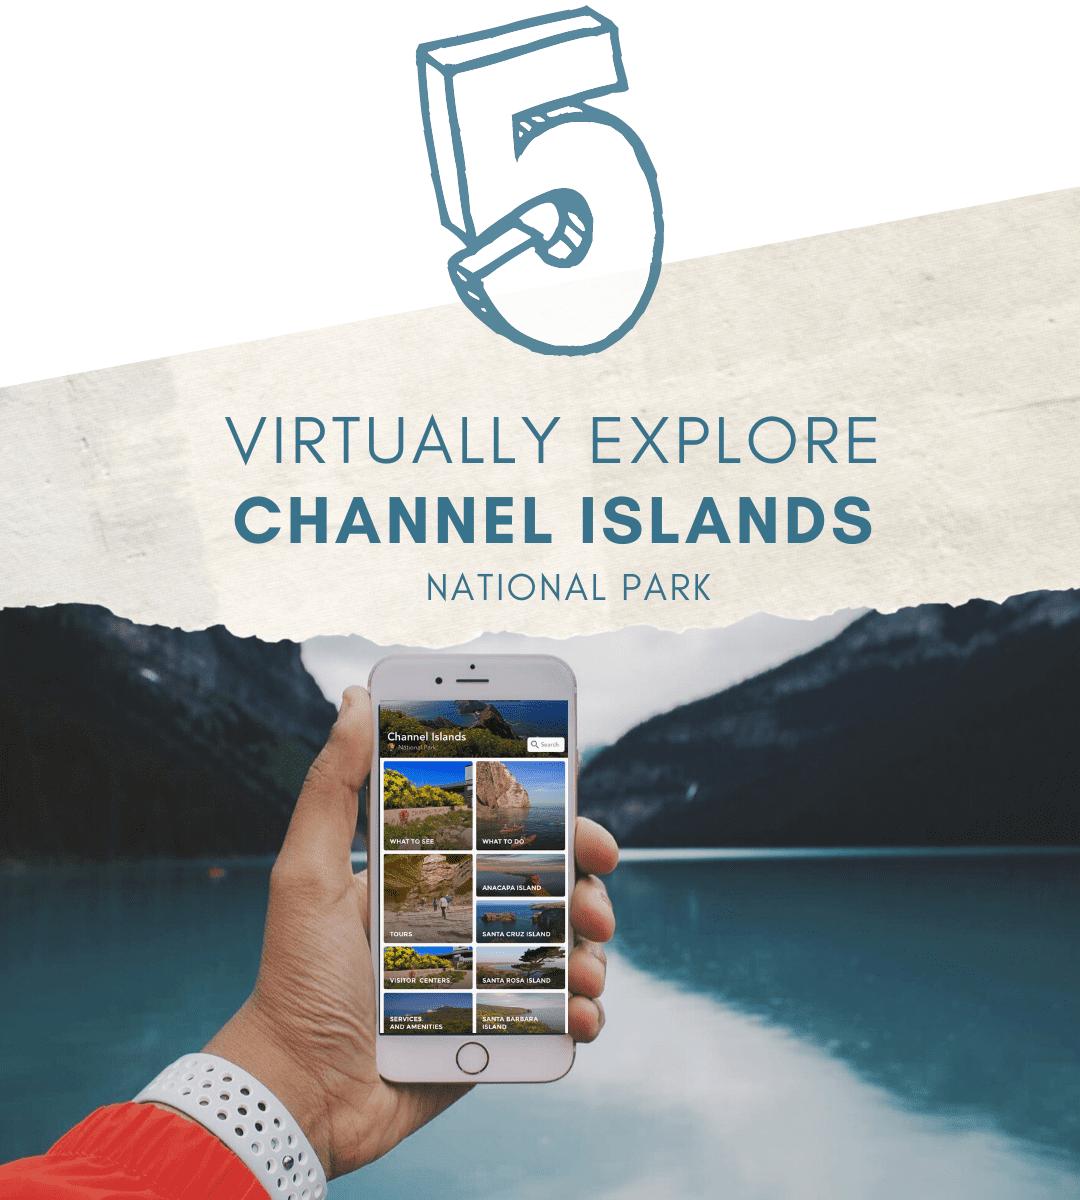 virtually explore